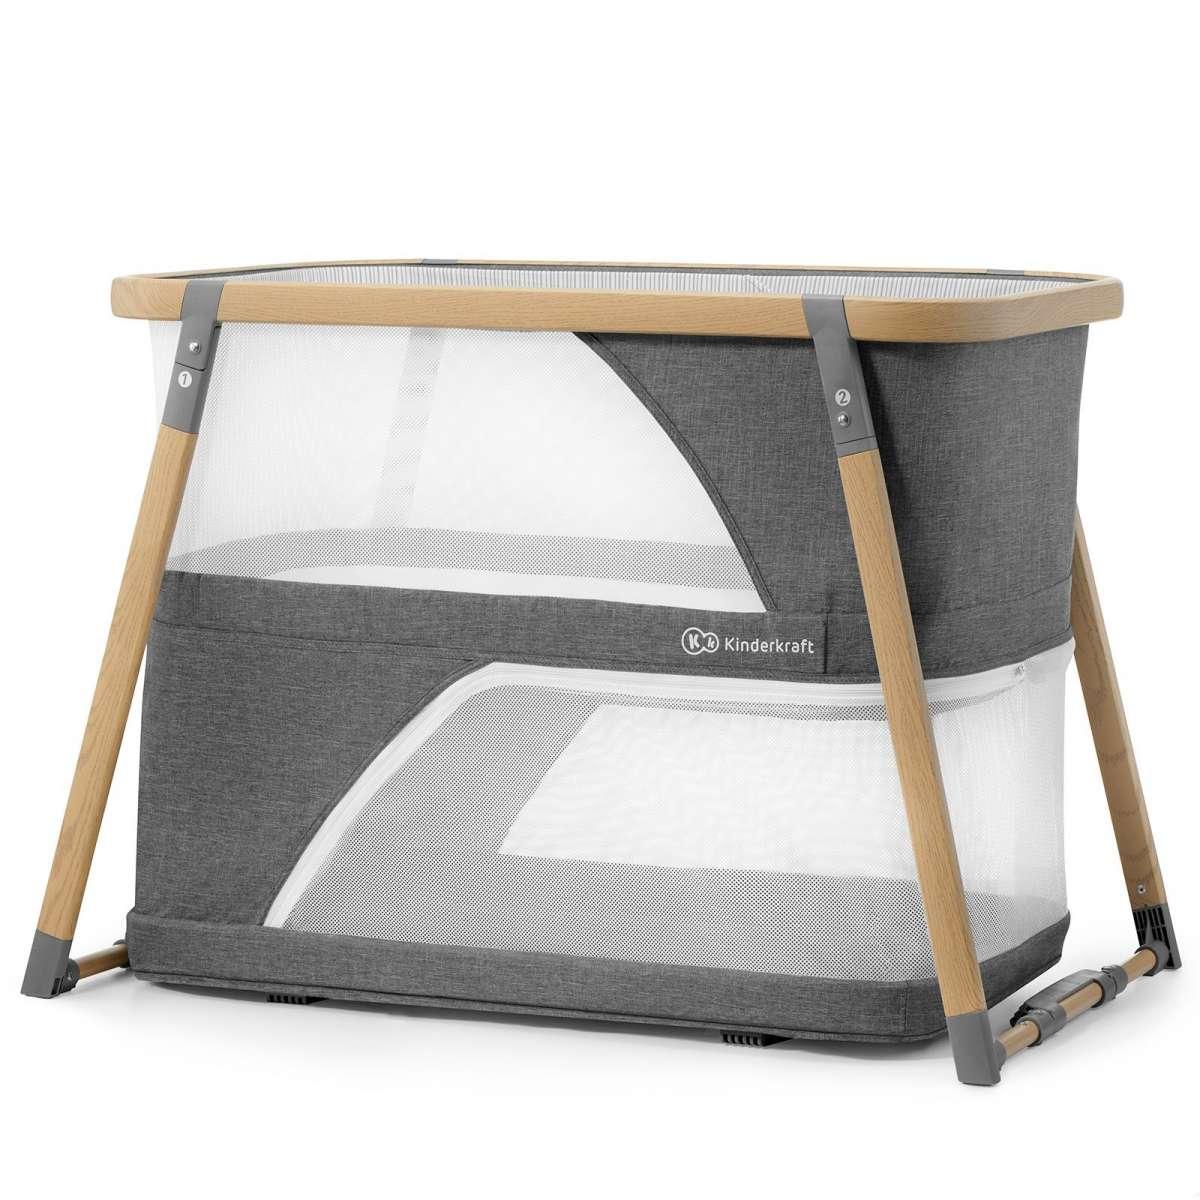 KinderKraft Sofi Grey Divlīmeņu bērnu ceļojumu gultiņa 4in1